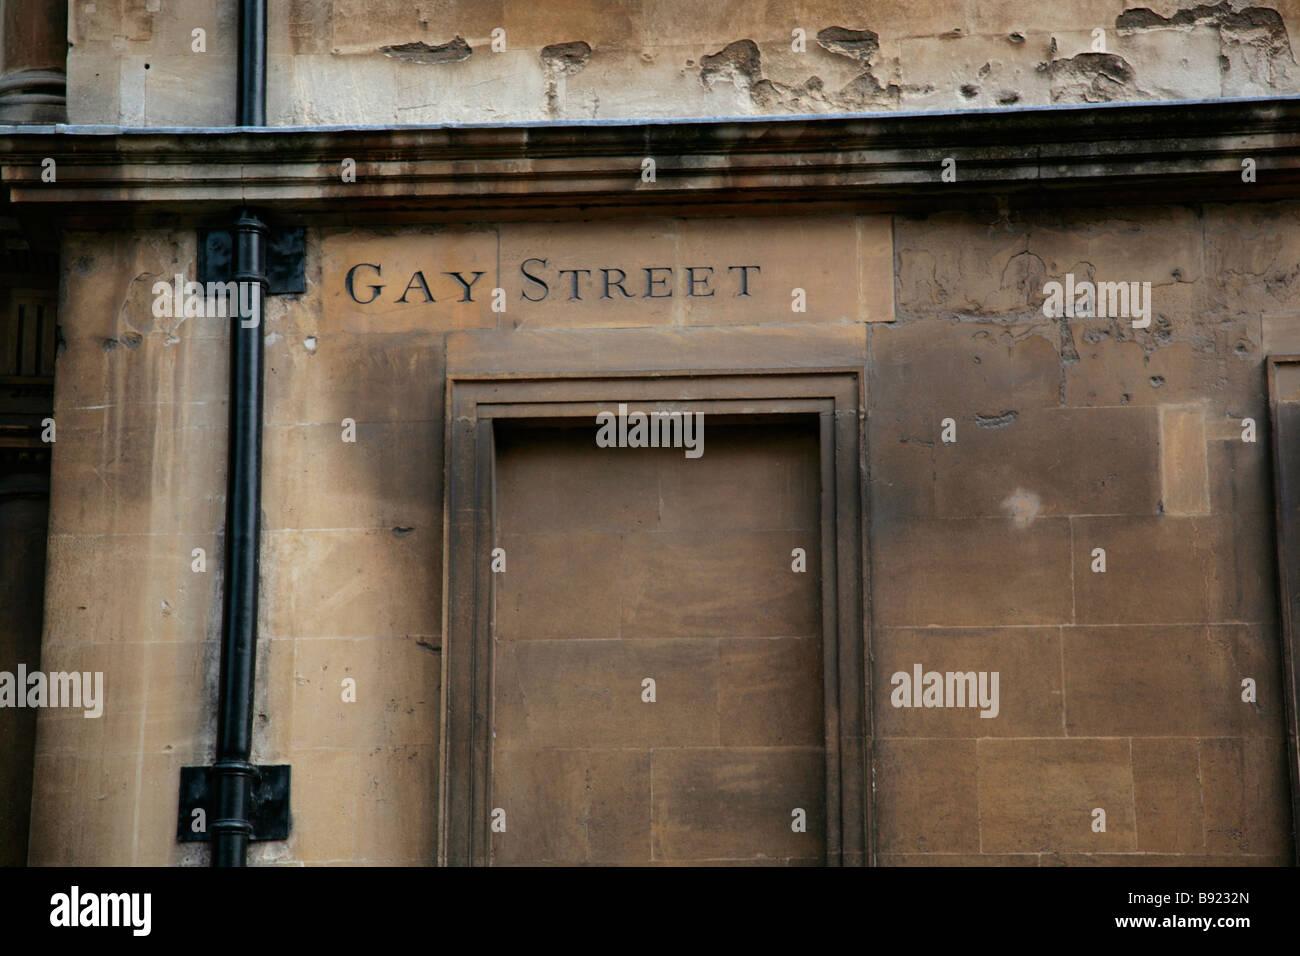 Vasca Da Bagno Karen : Gay street strada segno sulla vasca da bagno muro di pietra bagno